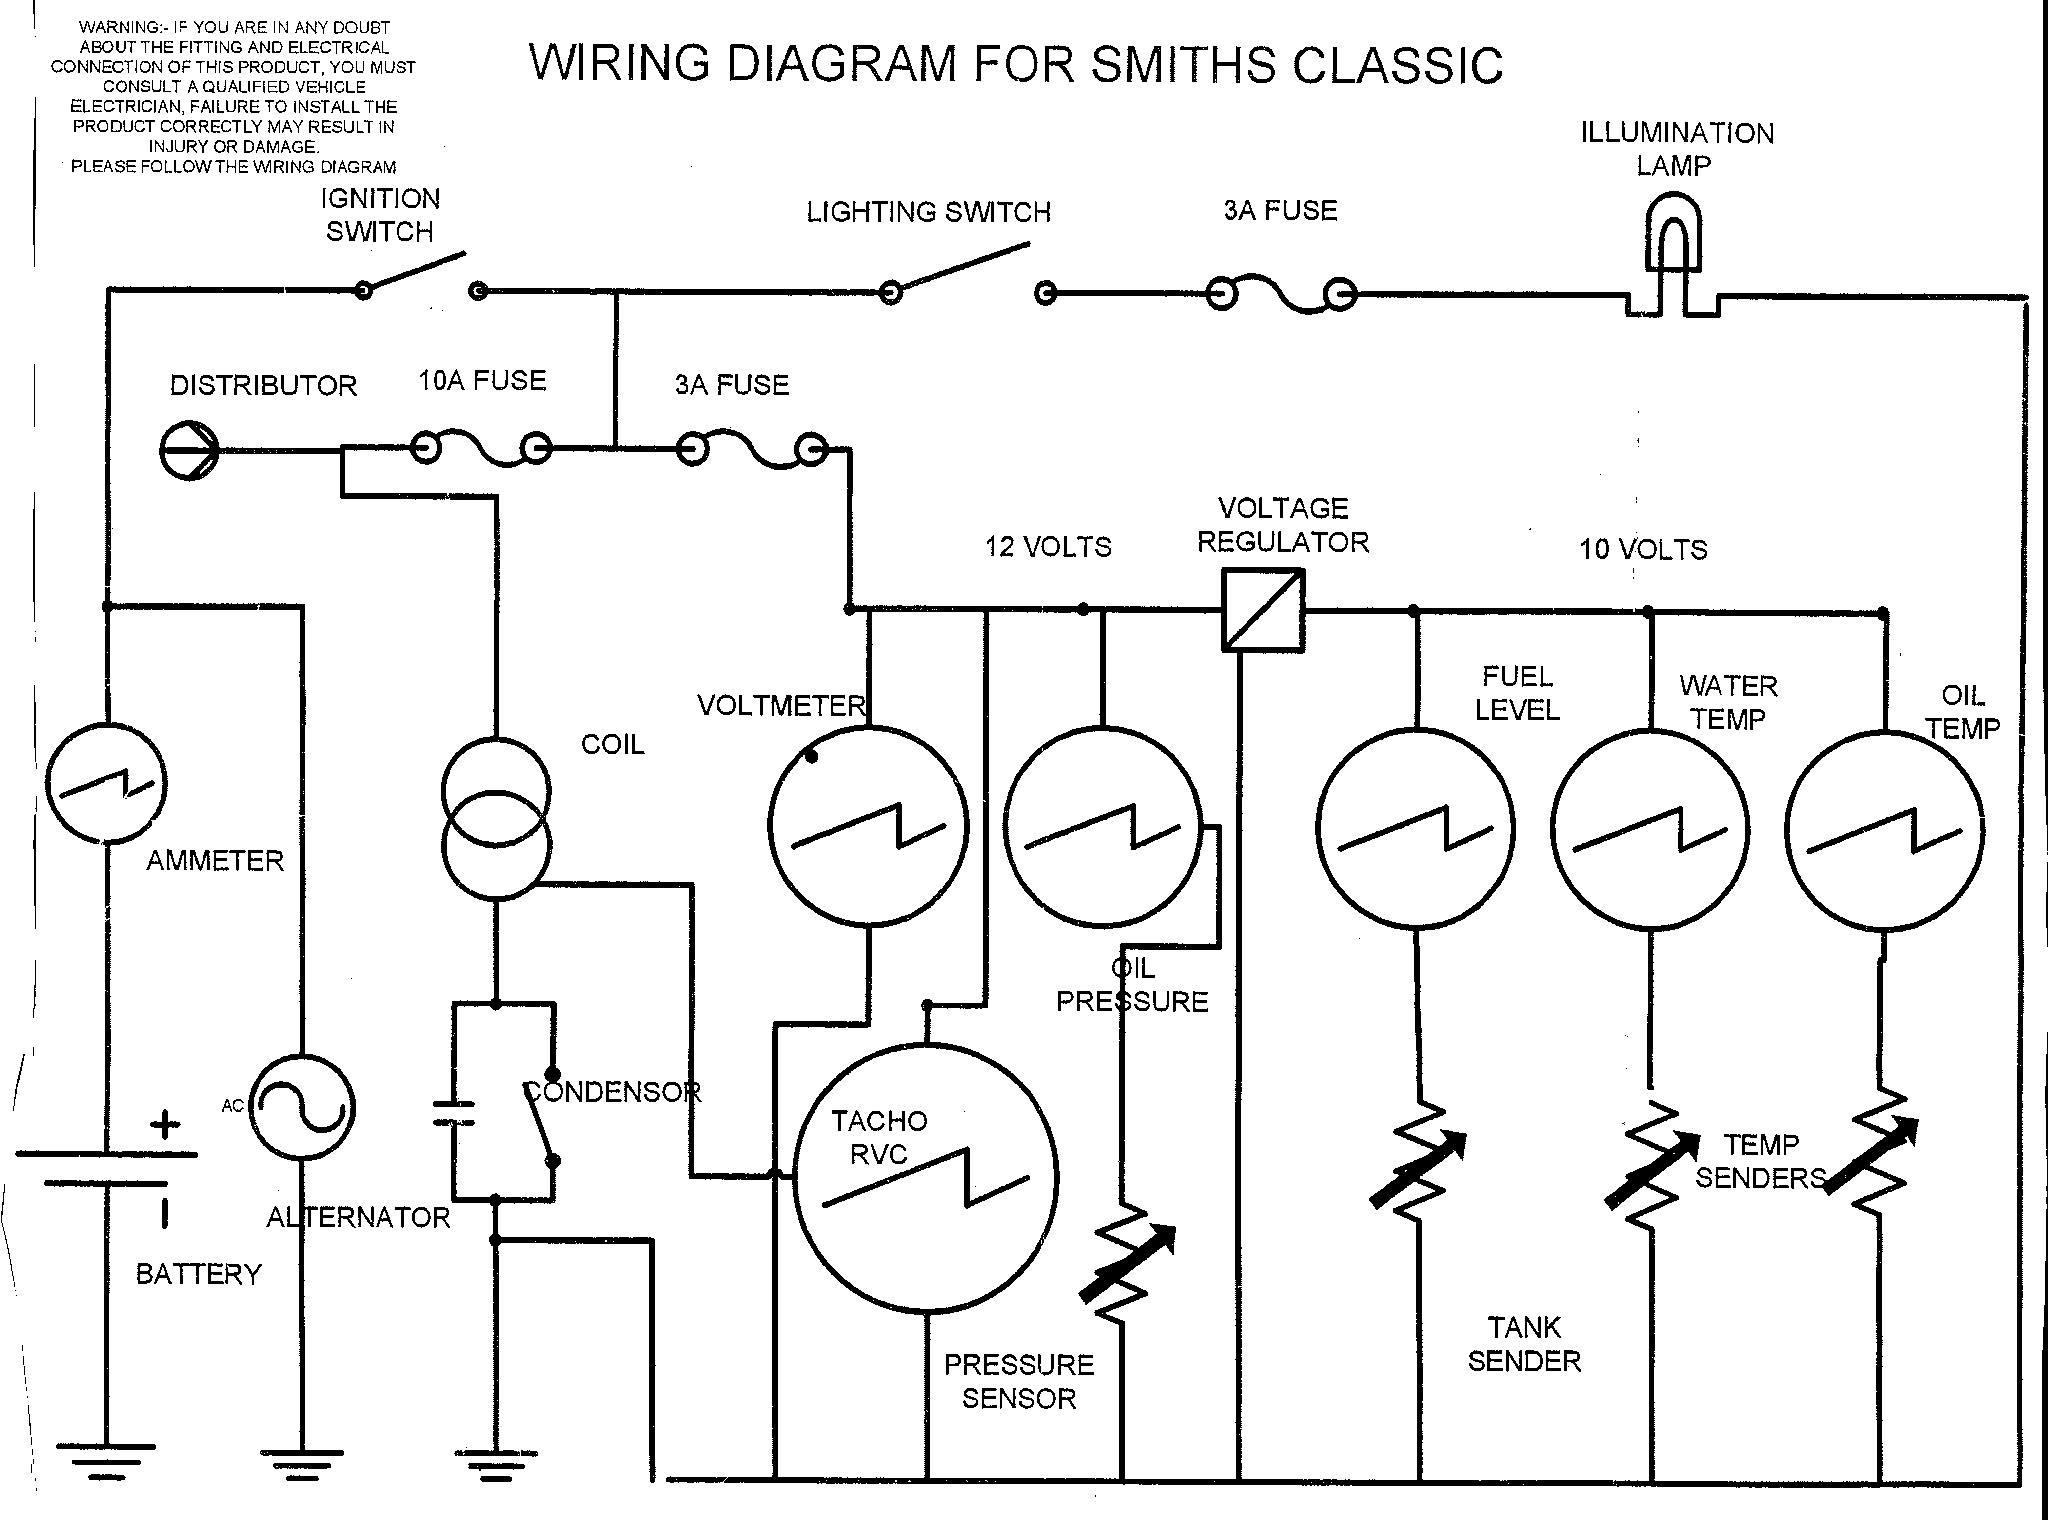 Auto Meter Speedo Wiring Diagram | Wiring Library - Universal Fuel Gauge Wiring Diagram